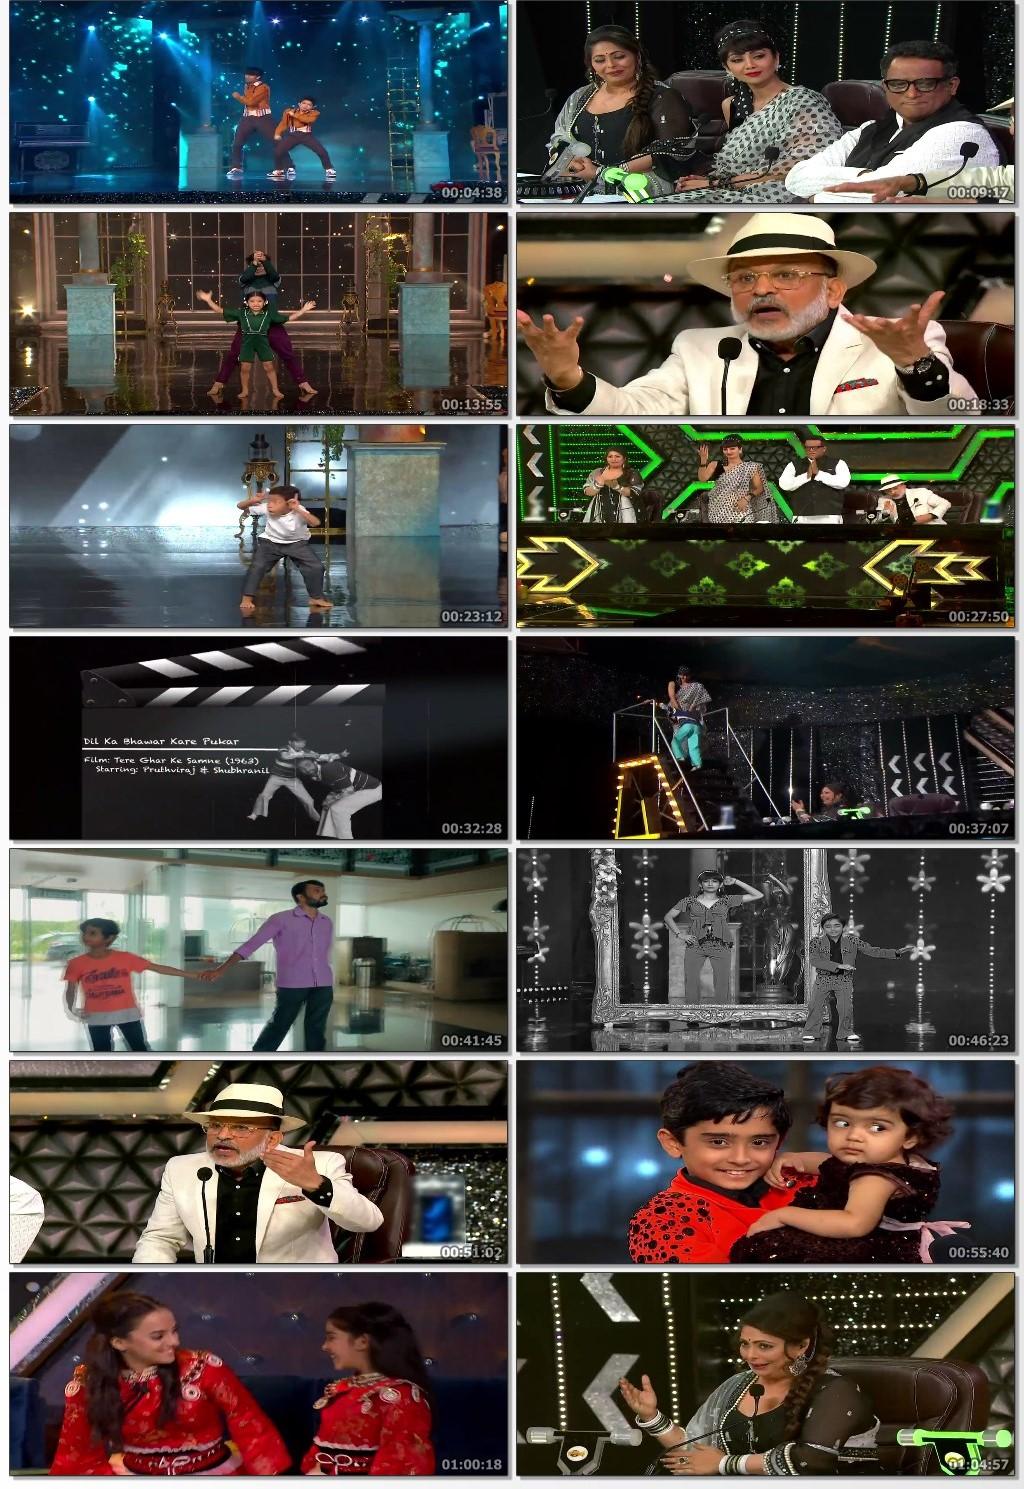 Super-Dancer-Chapter-4-3-July-2021-Hindi-720p-HDRip-480-MB-mkv-thumbs1c35eef8f249dbc1